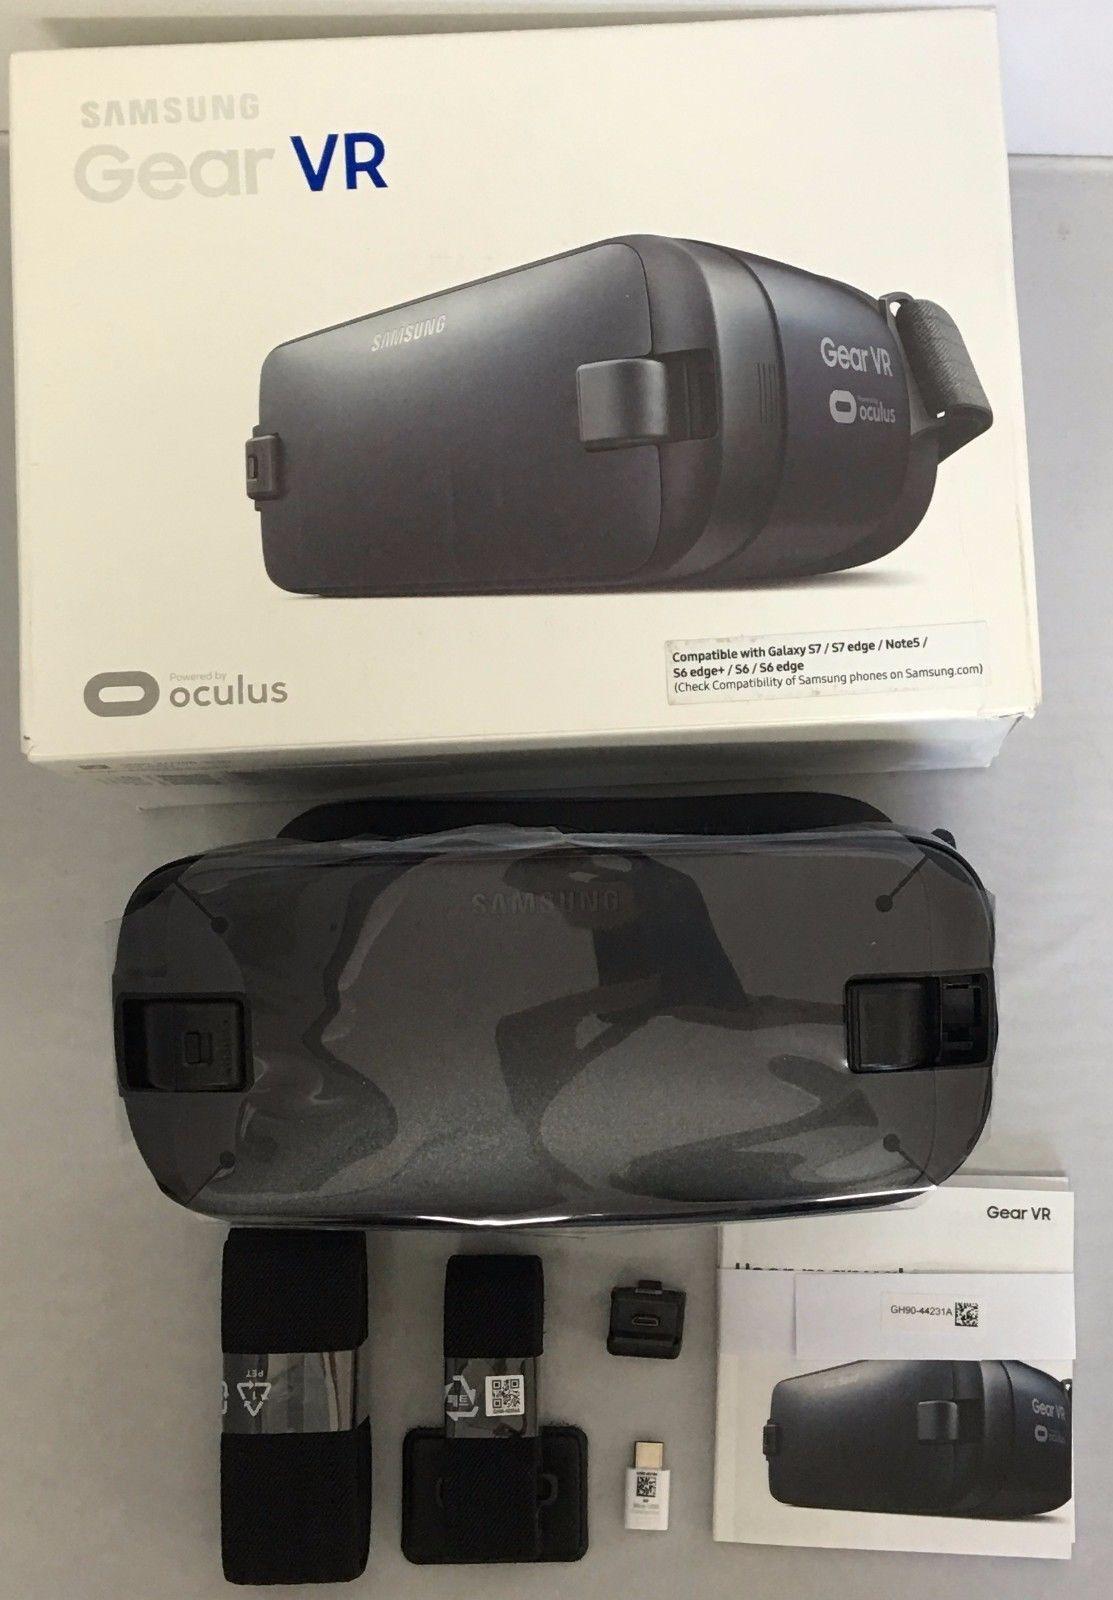 Samsung Gear VR 2 Oculus Virtual Reality Headset 2016 SM-R323 Blue / Black USB-C